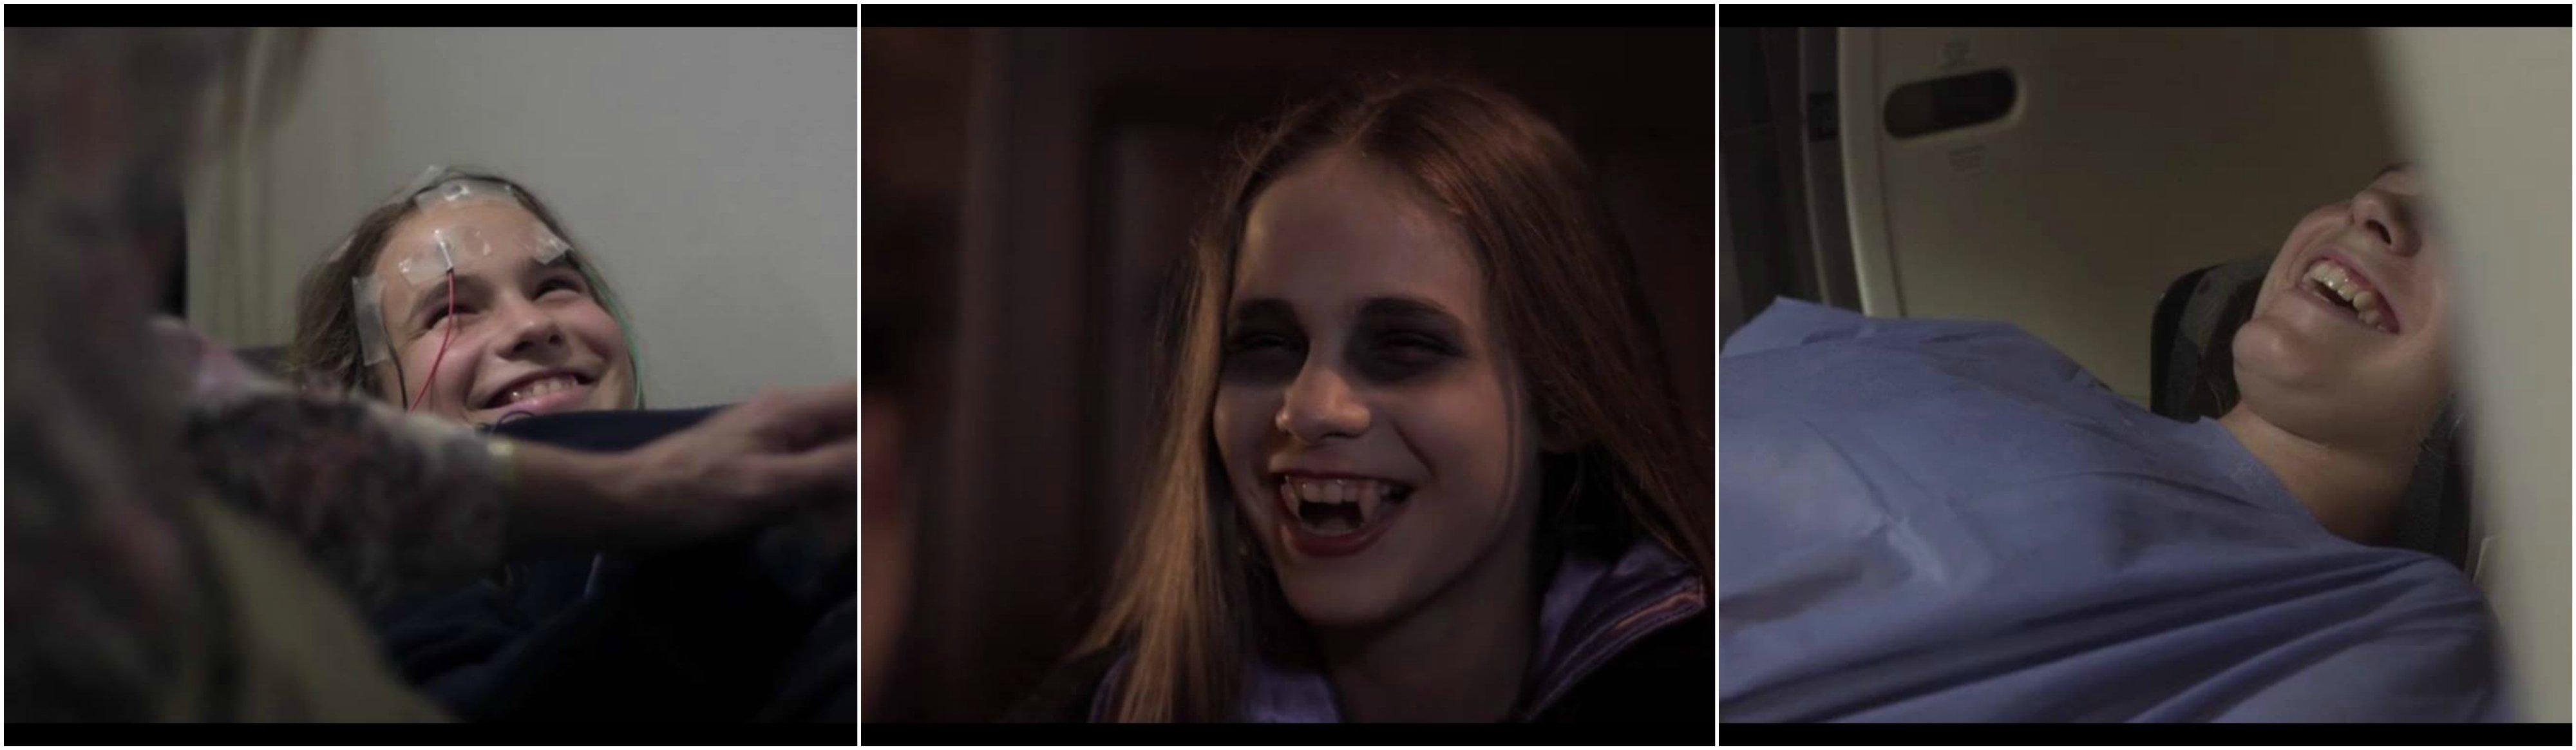 Juana sonrisa